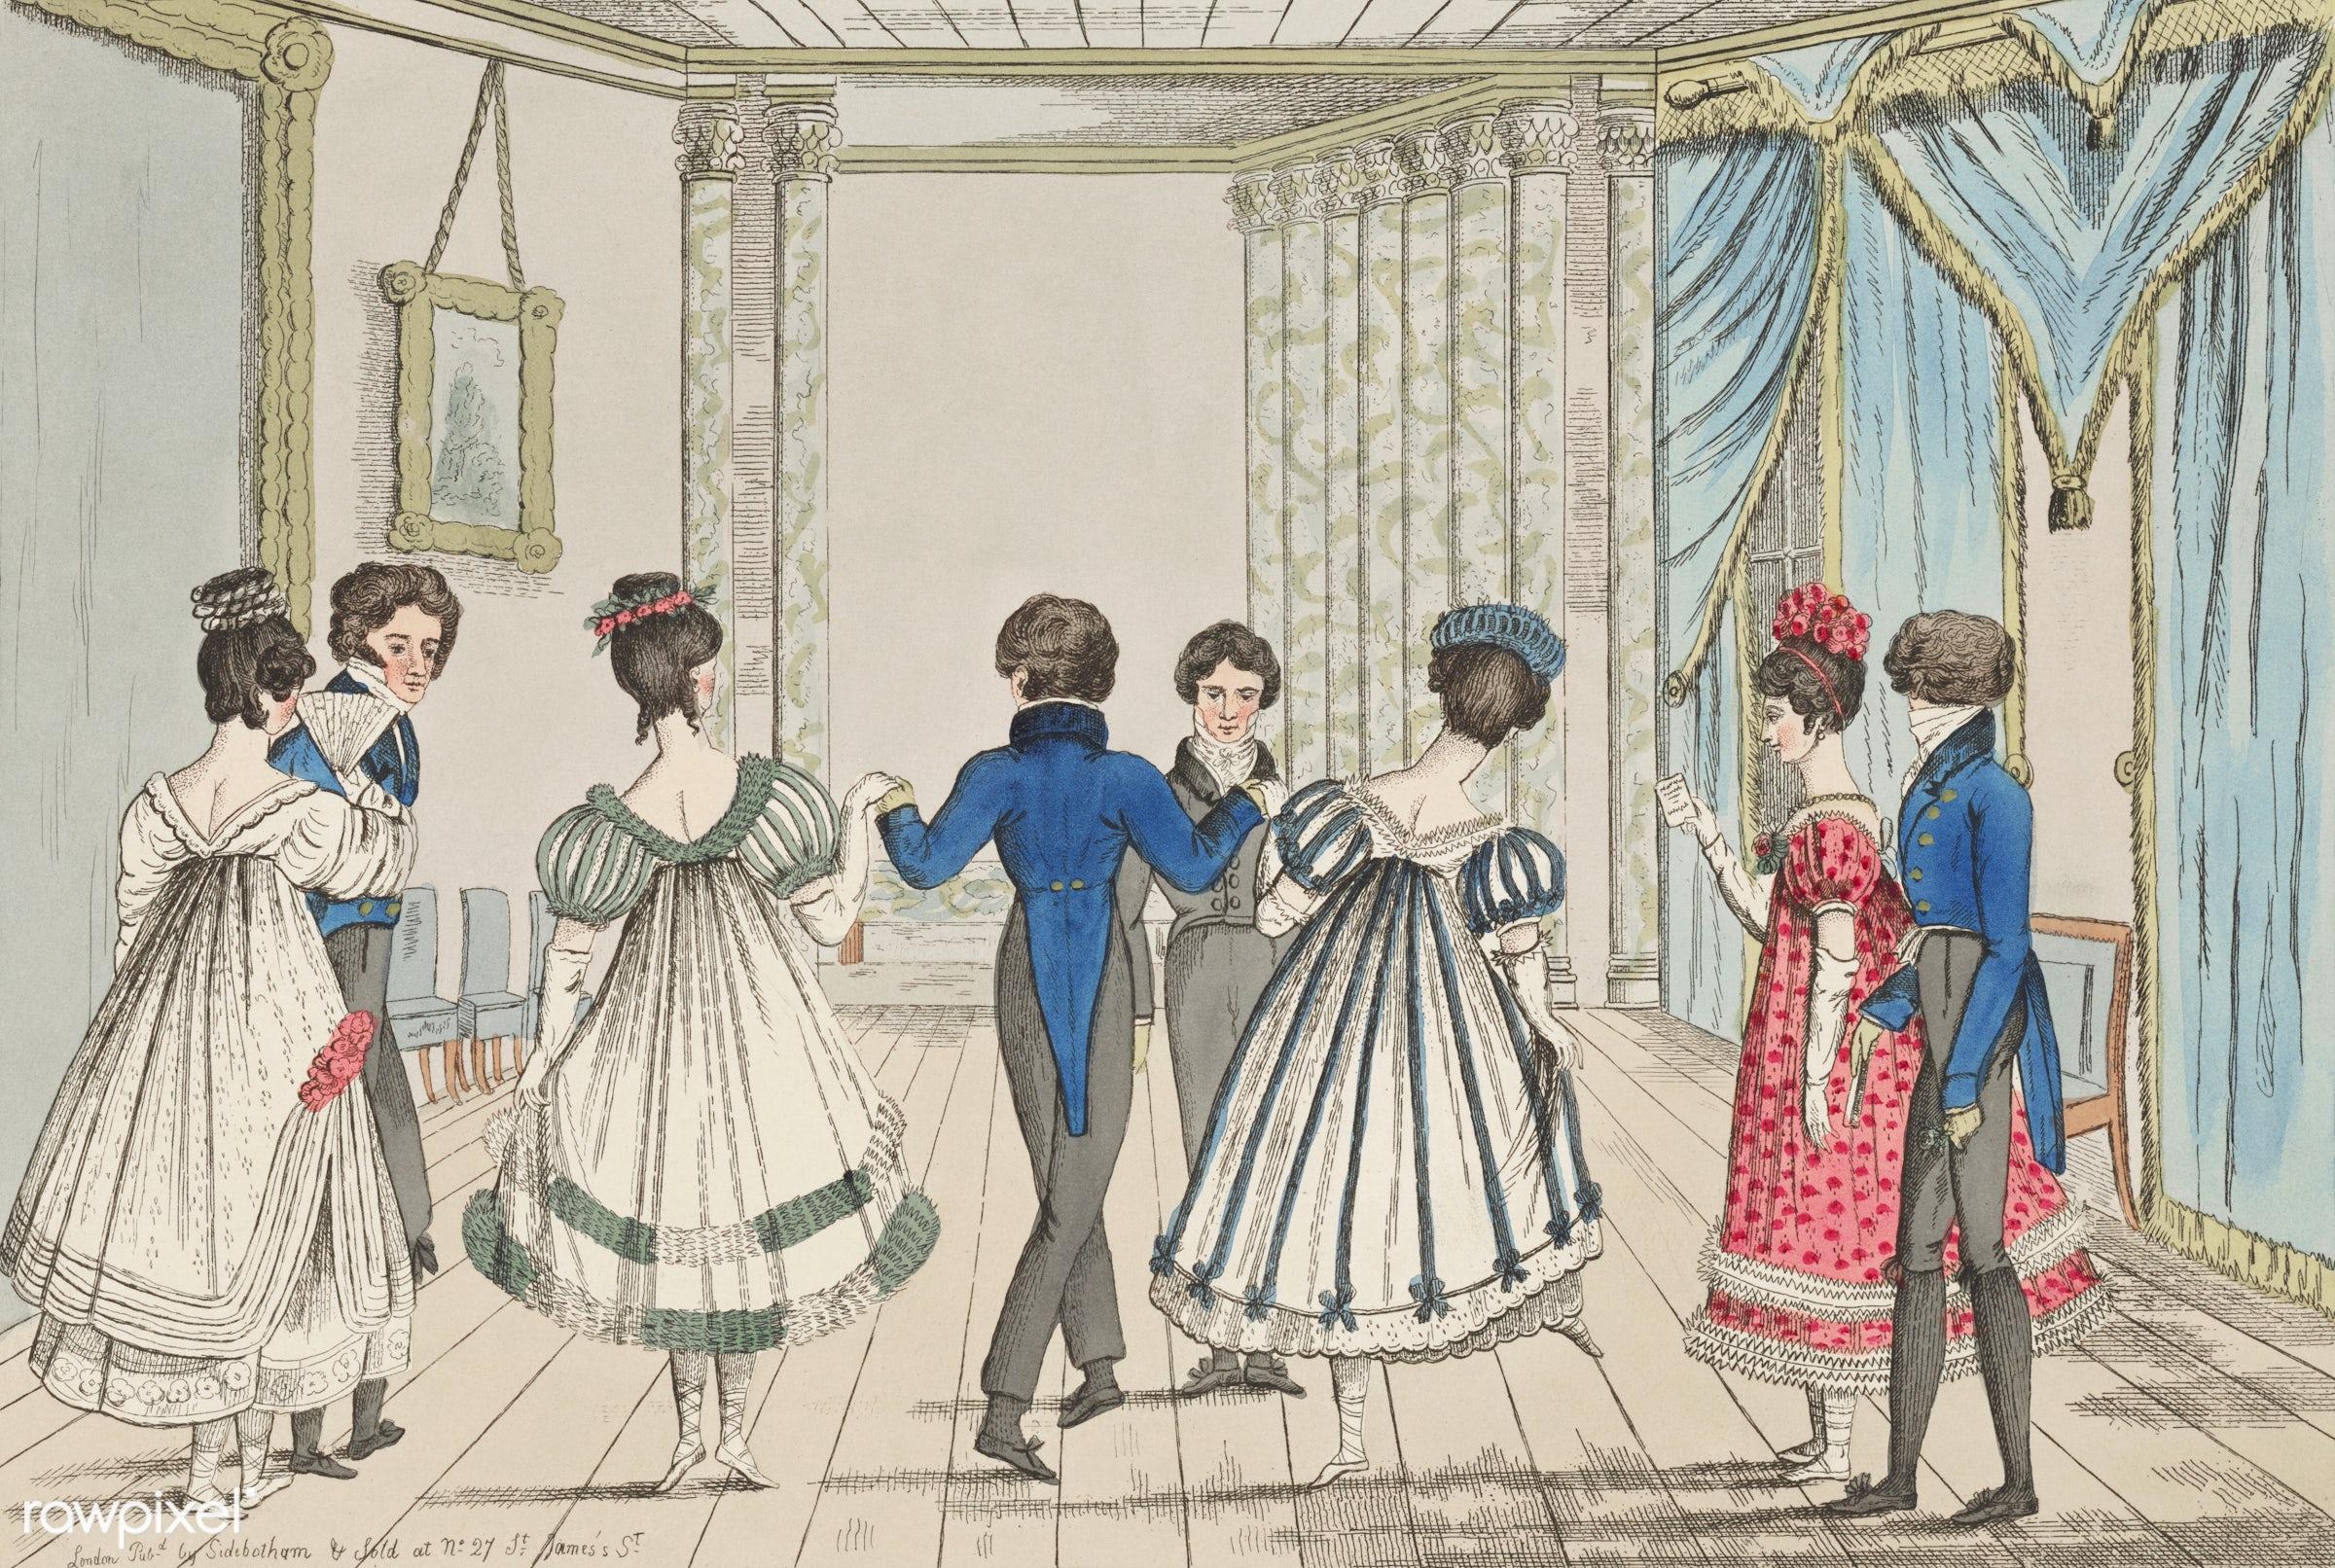 Vintage illustration of Quadrilles published in 1820-1820 by Sidebotham. - antique, artwork, ball, ballroom, cc0, couples,...